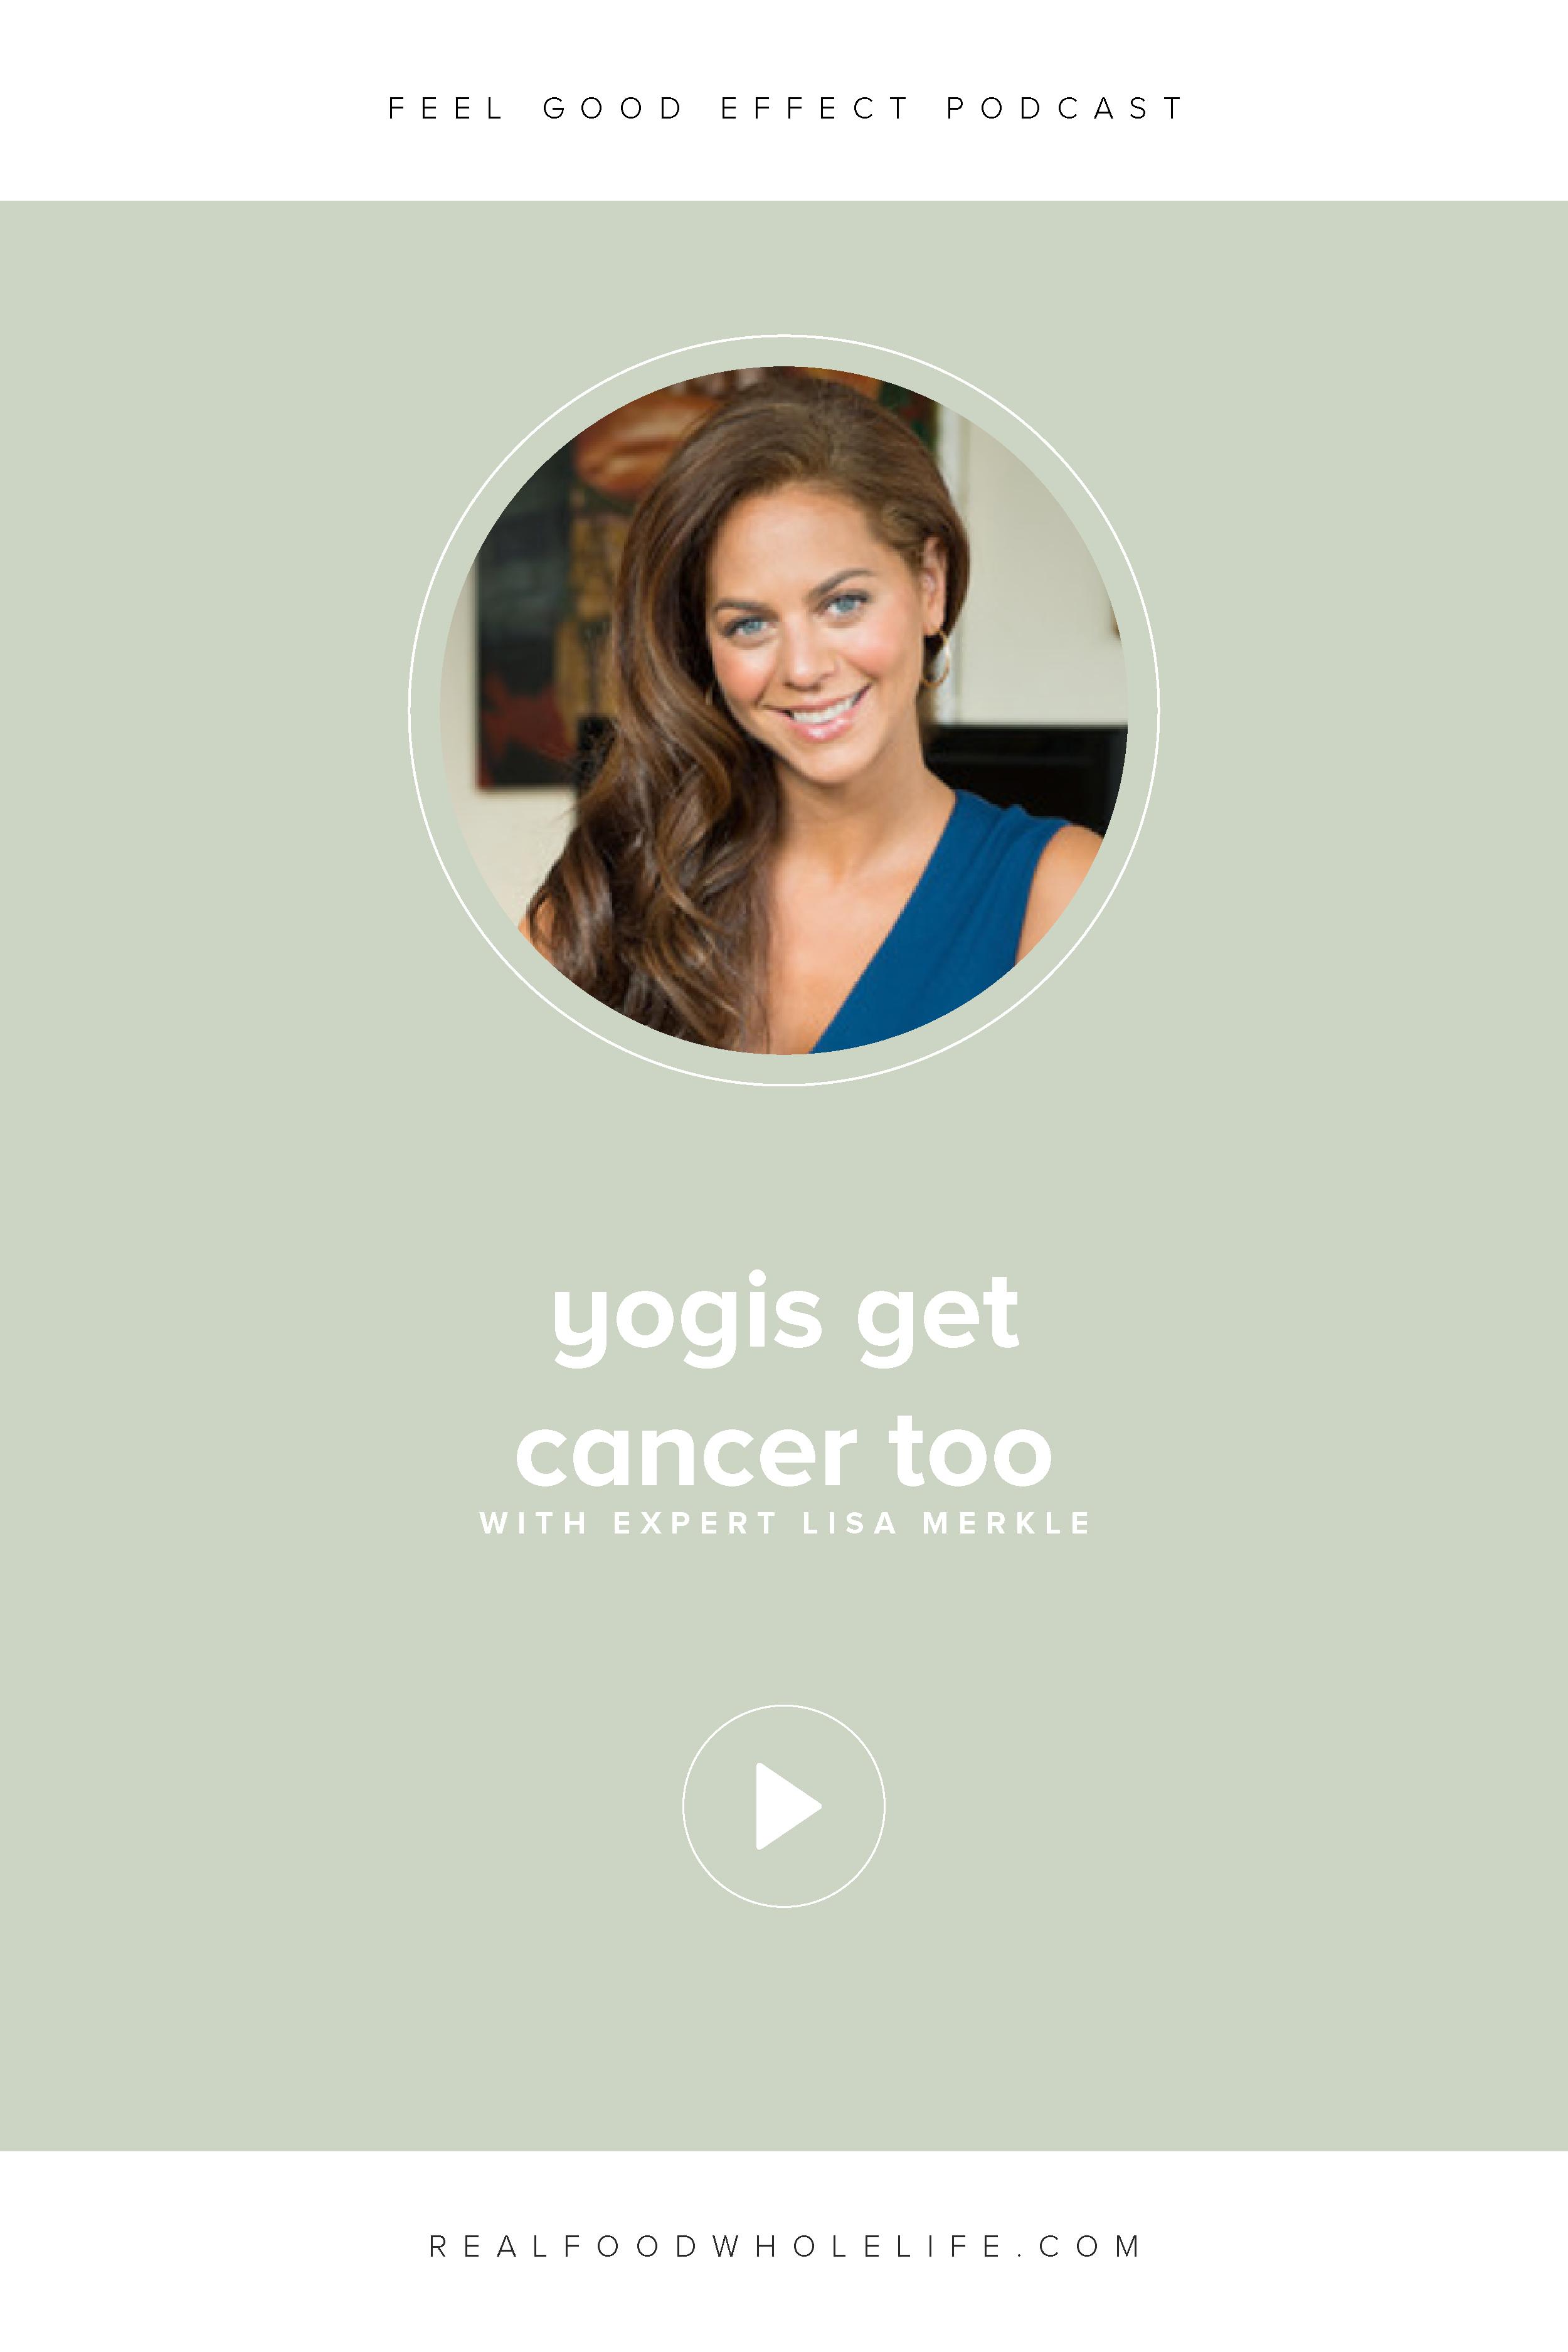 Yogi's Get Cancer Too, with Lisa Merkle